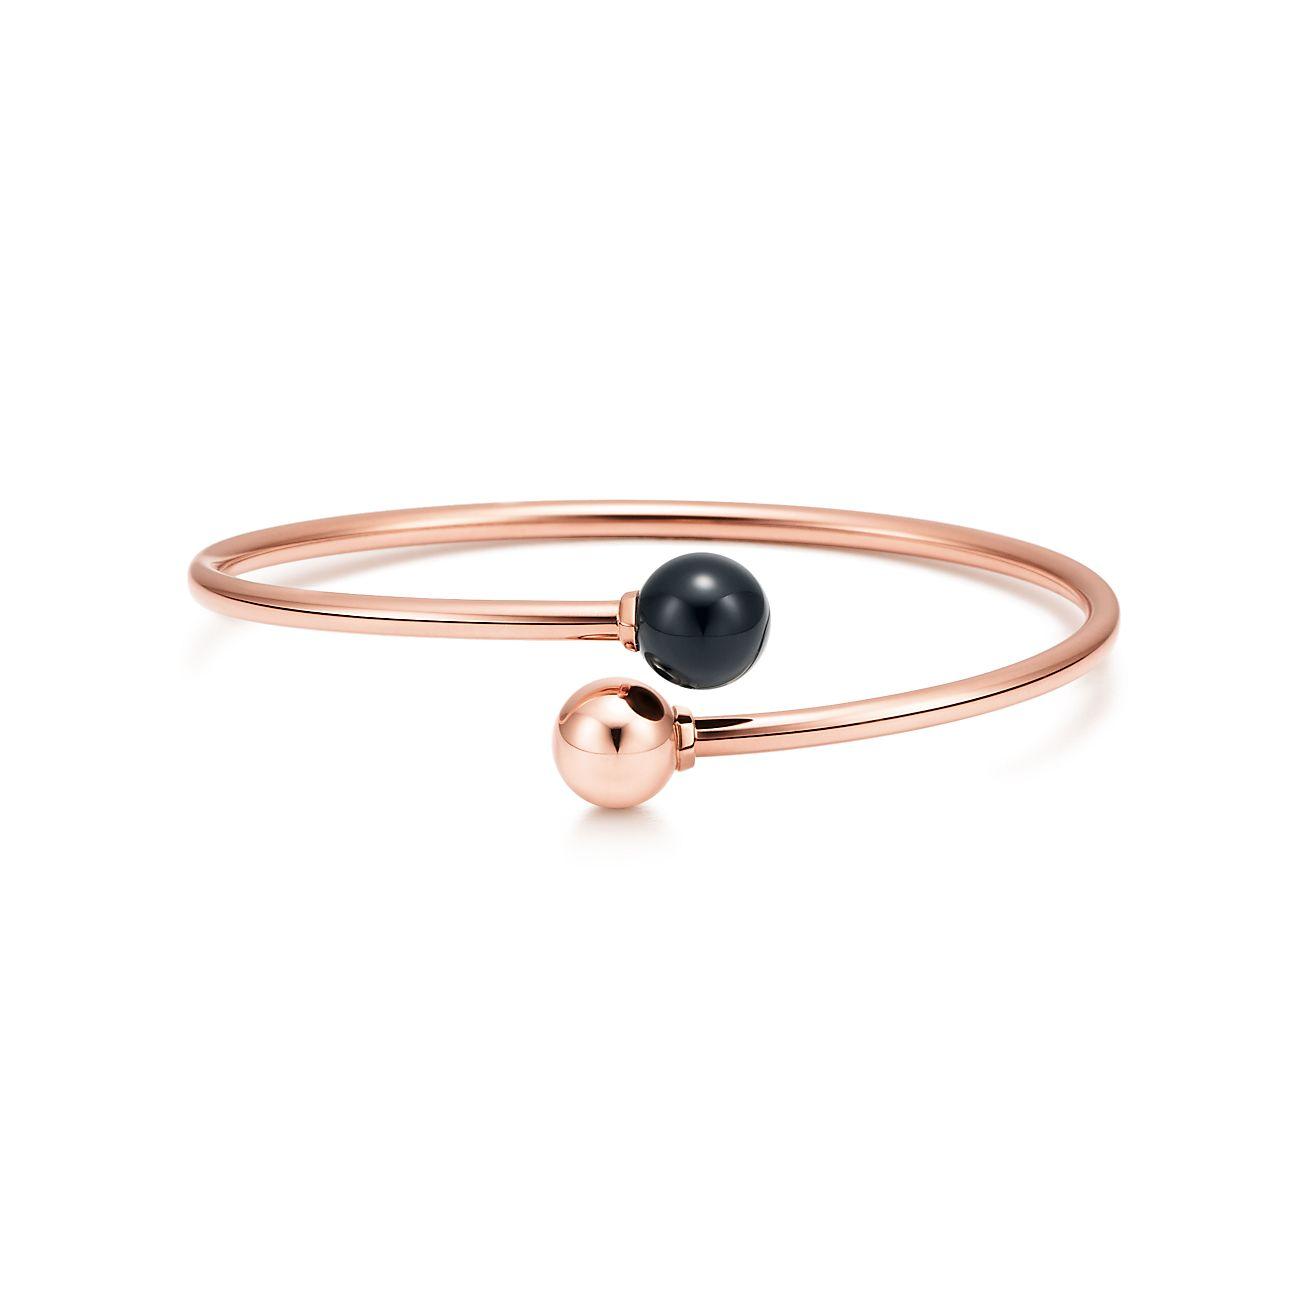 Tiffany City HardWear ball bypass bracelet in 18k rose gold, small Tiffany & Co.